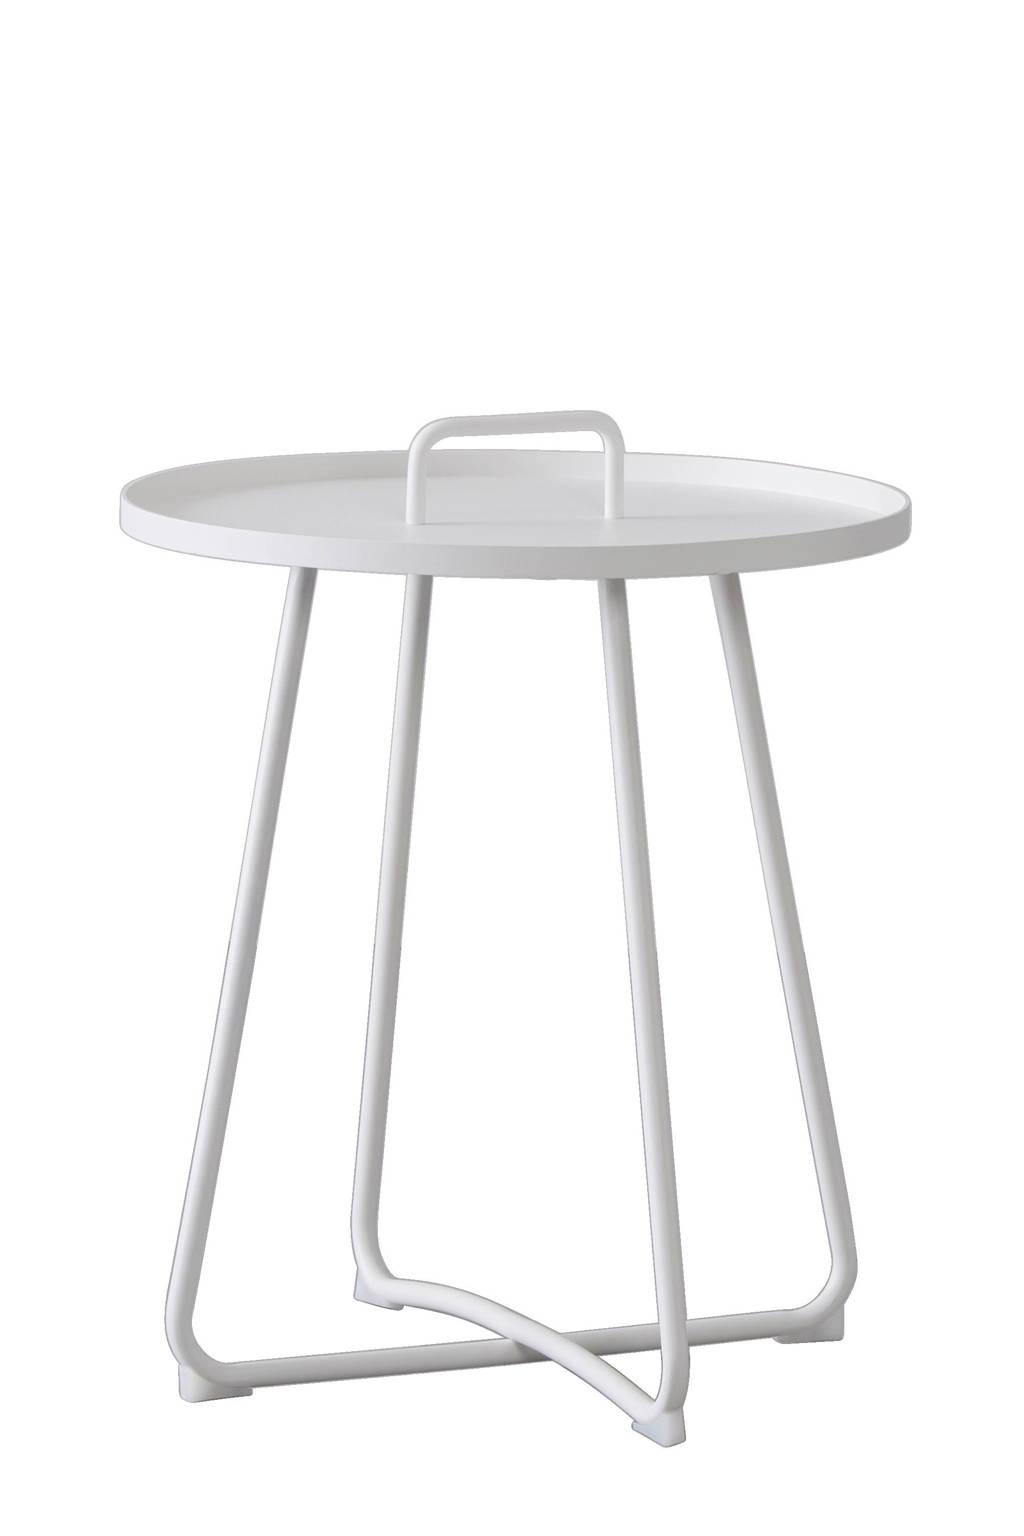 SenS-Line bijzettafel Jennifer (ø50 cm), Wit